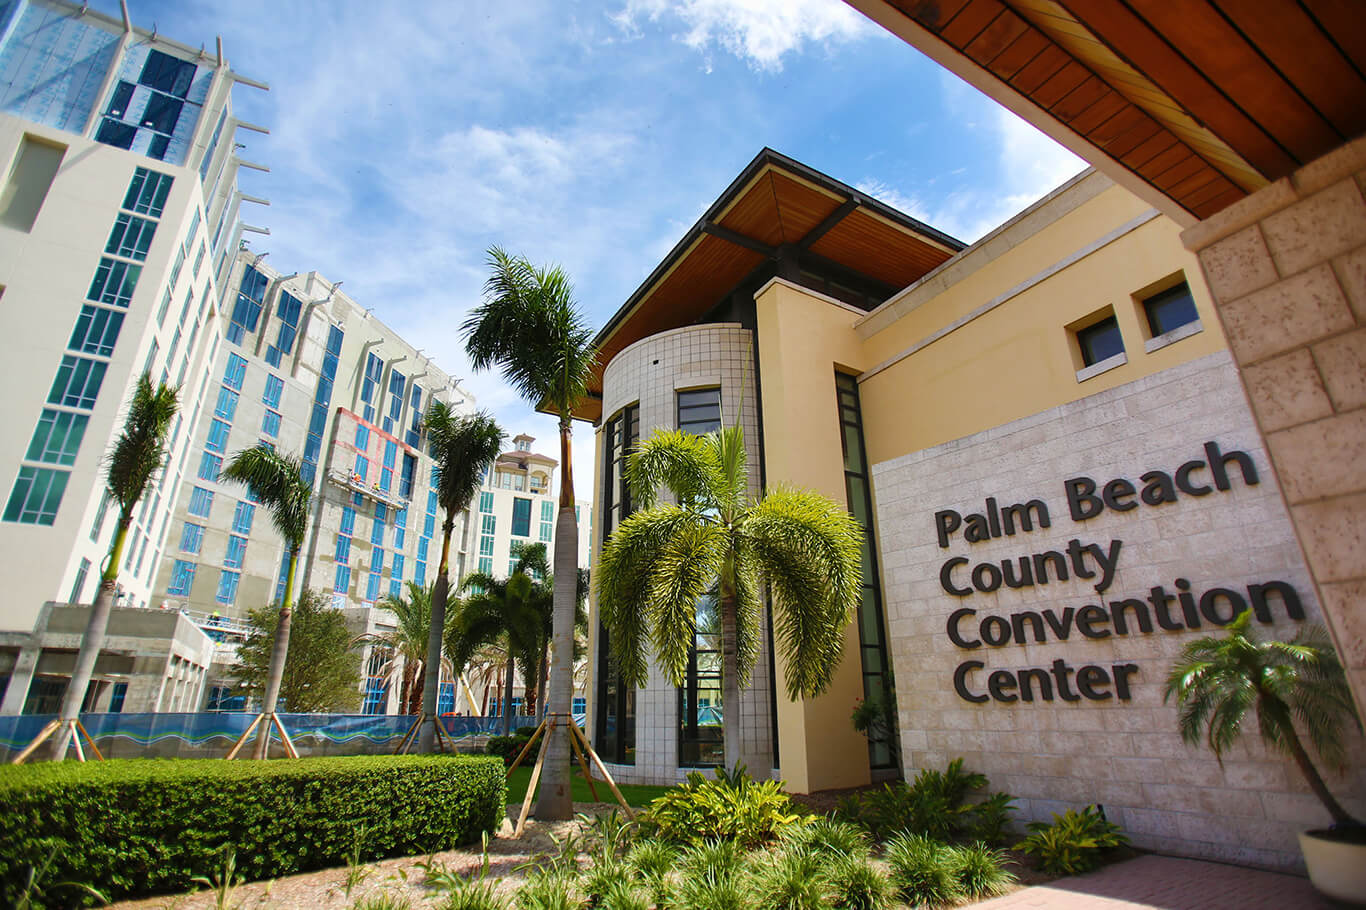 Ari Rollnick Invited to Speak at Florida Attractions Association